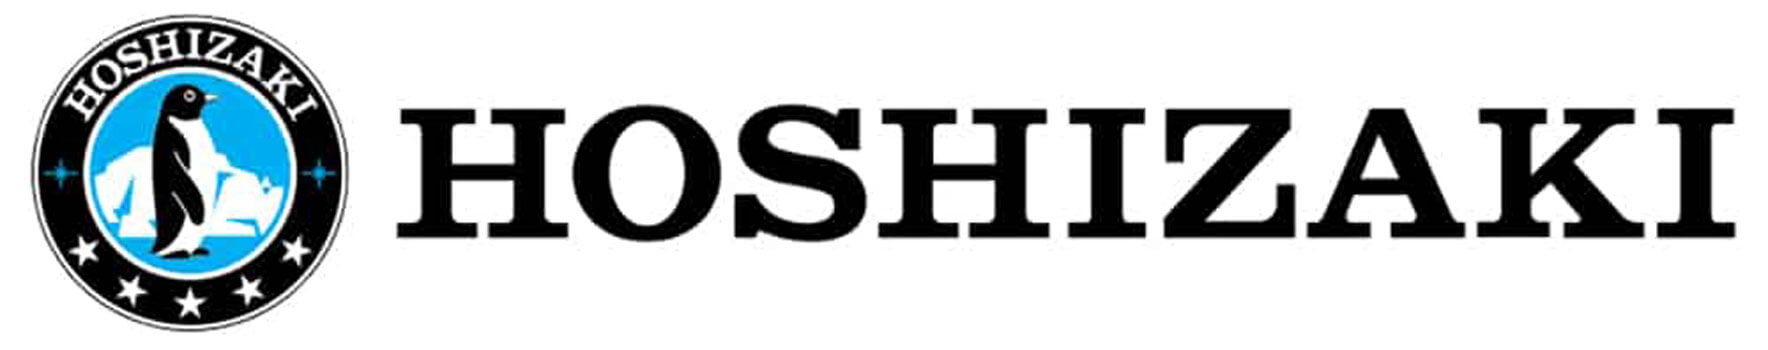 Hoshizaki Ice Maker Logo